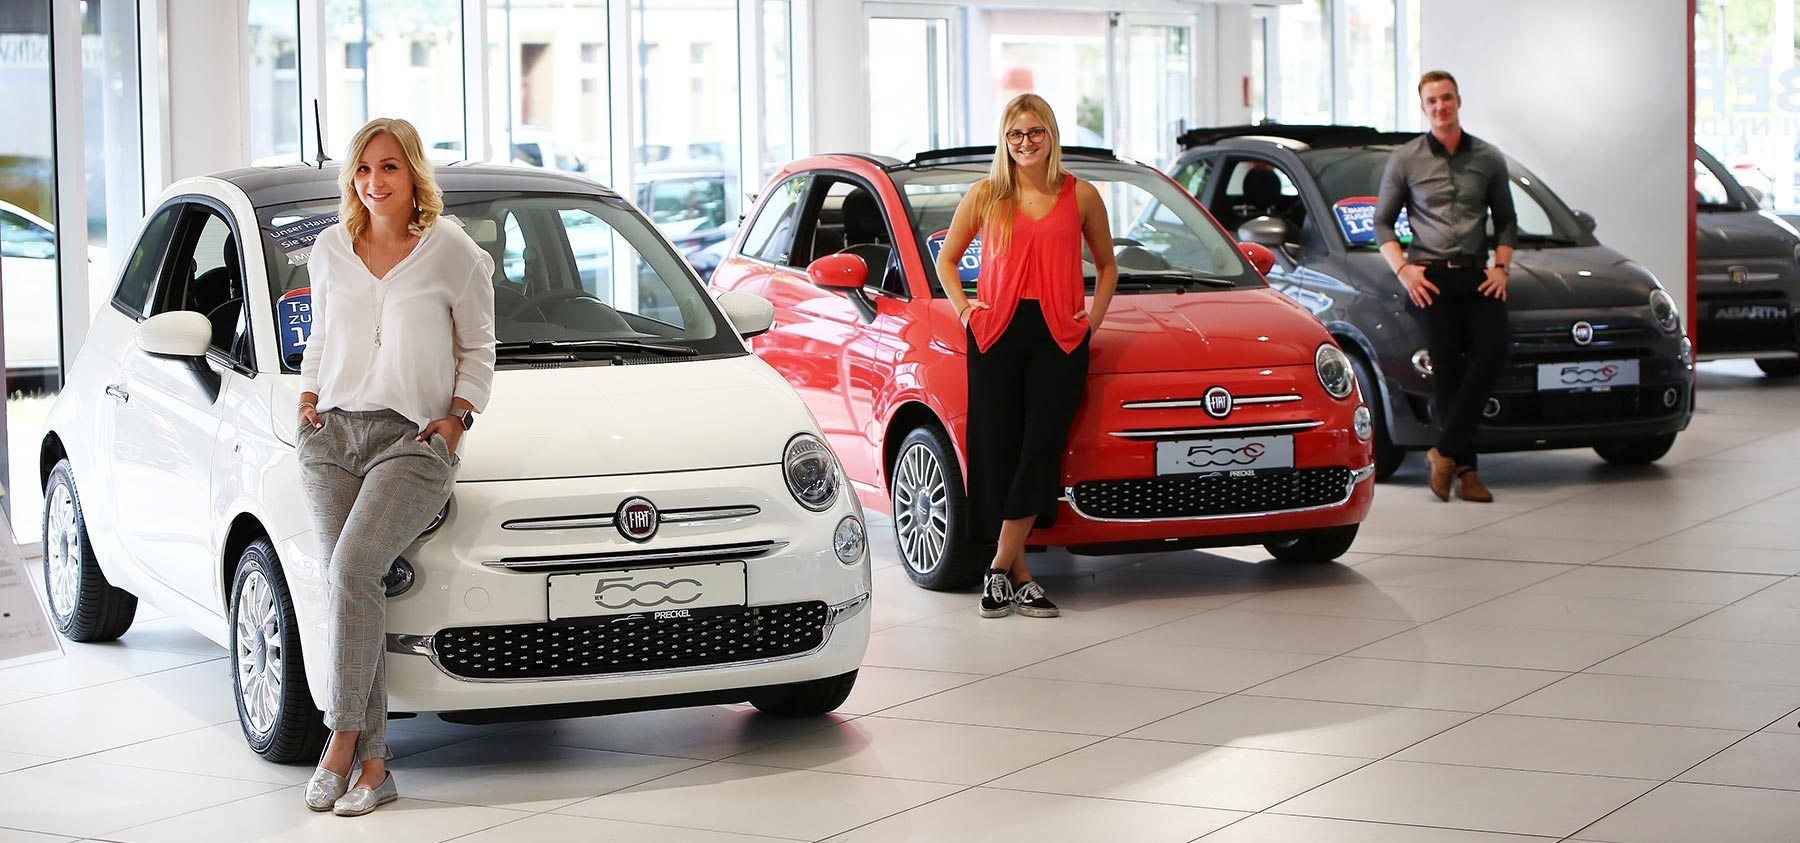 Fiat 500 Versionen im Autozentrum P&A-Preckel